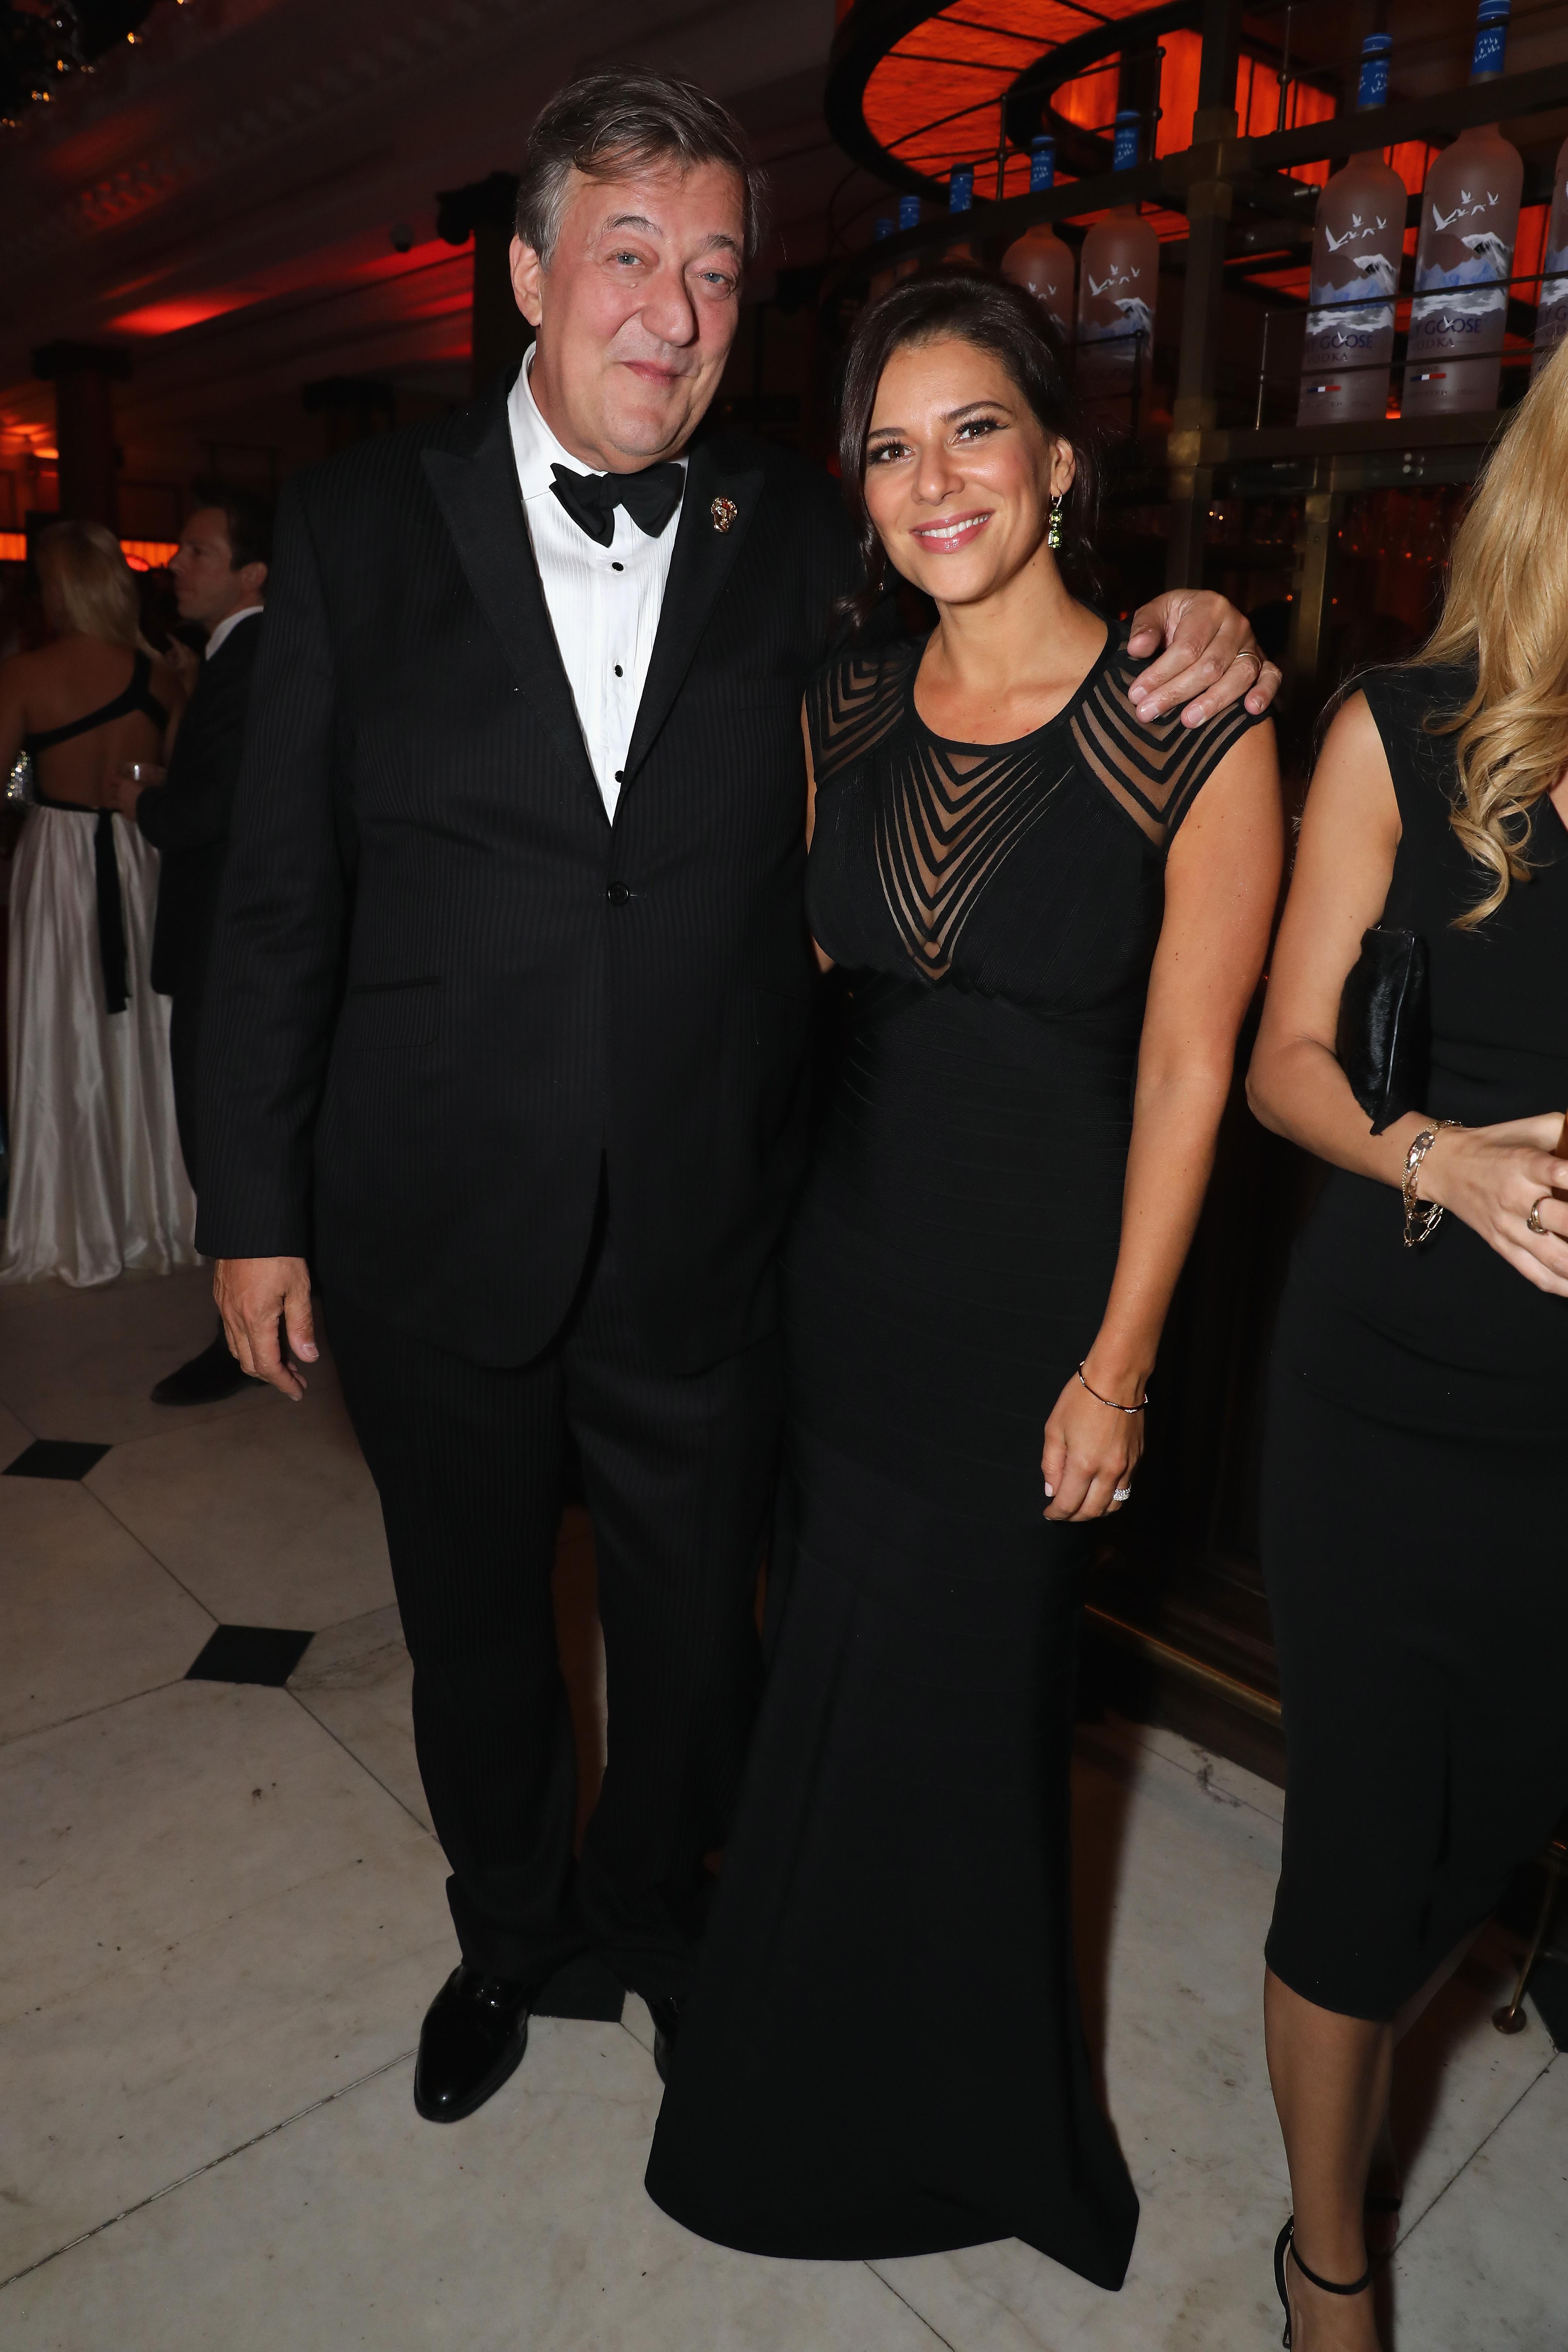 Stephen Fry and Kat Florence